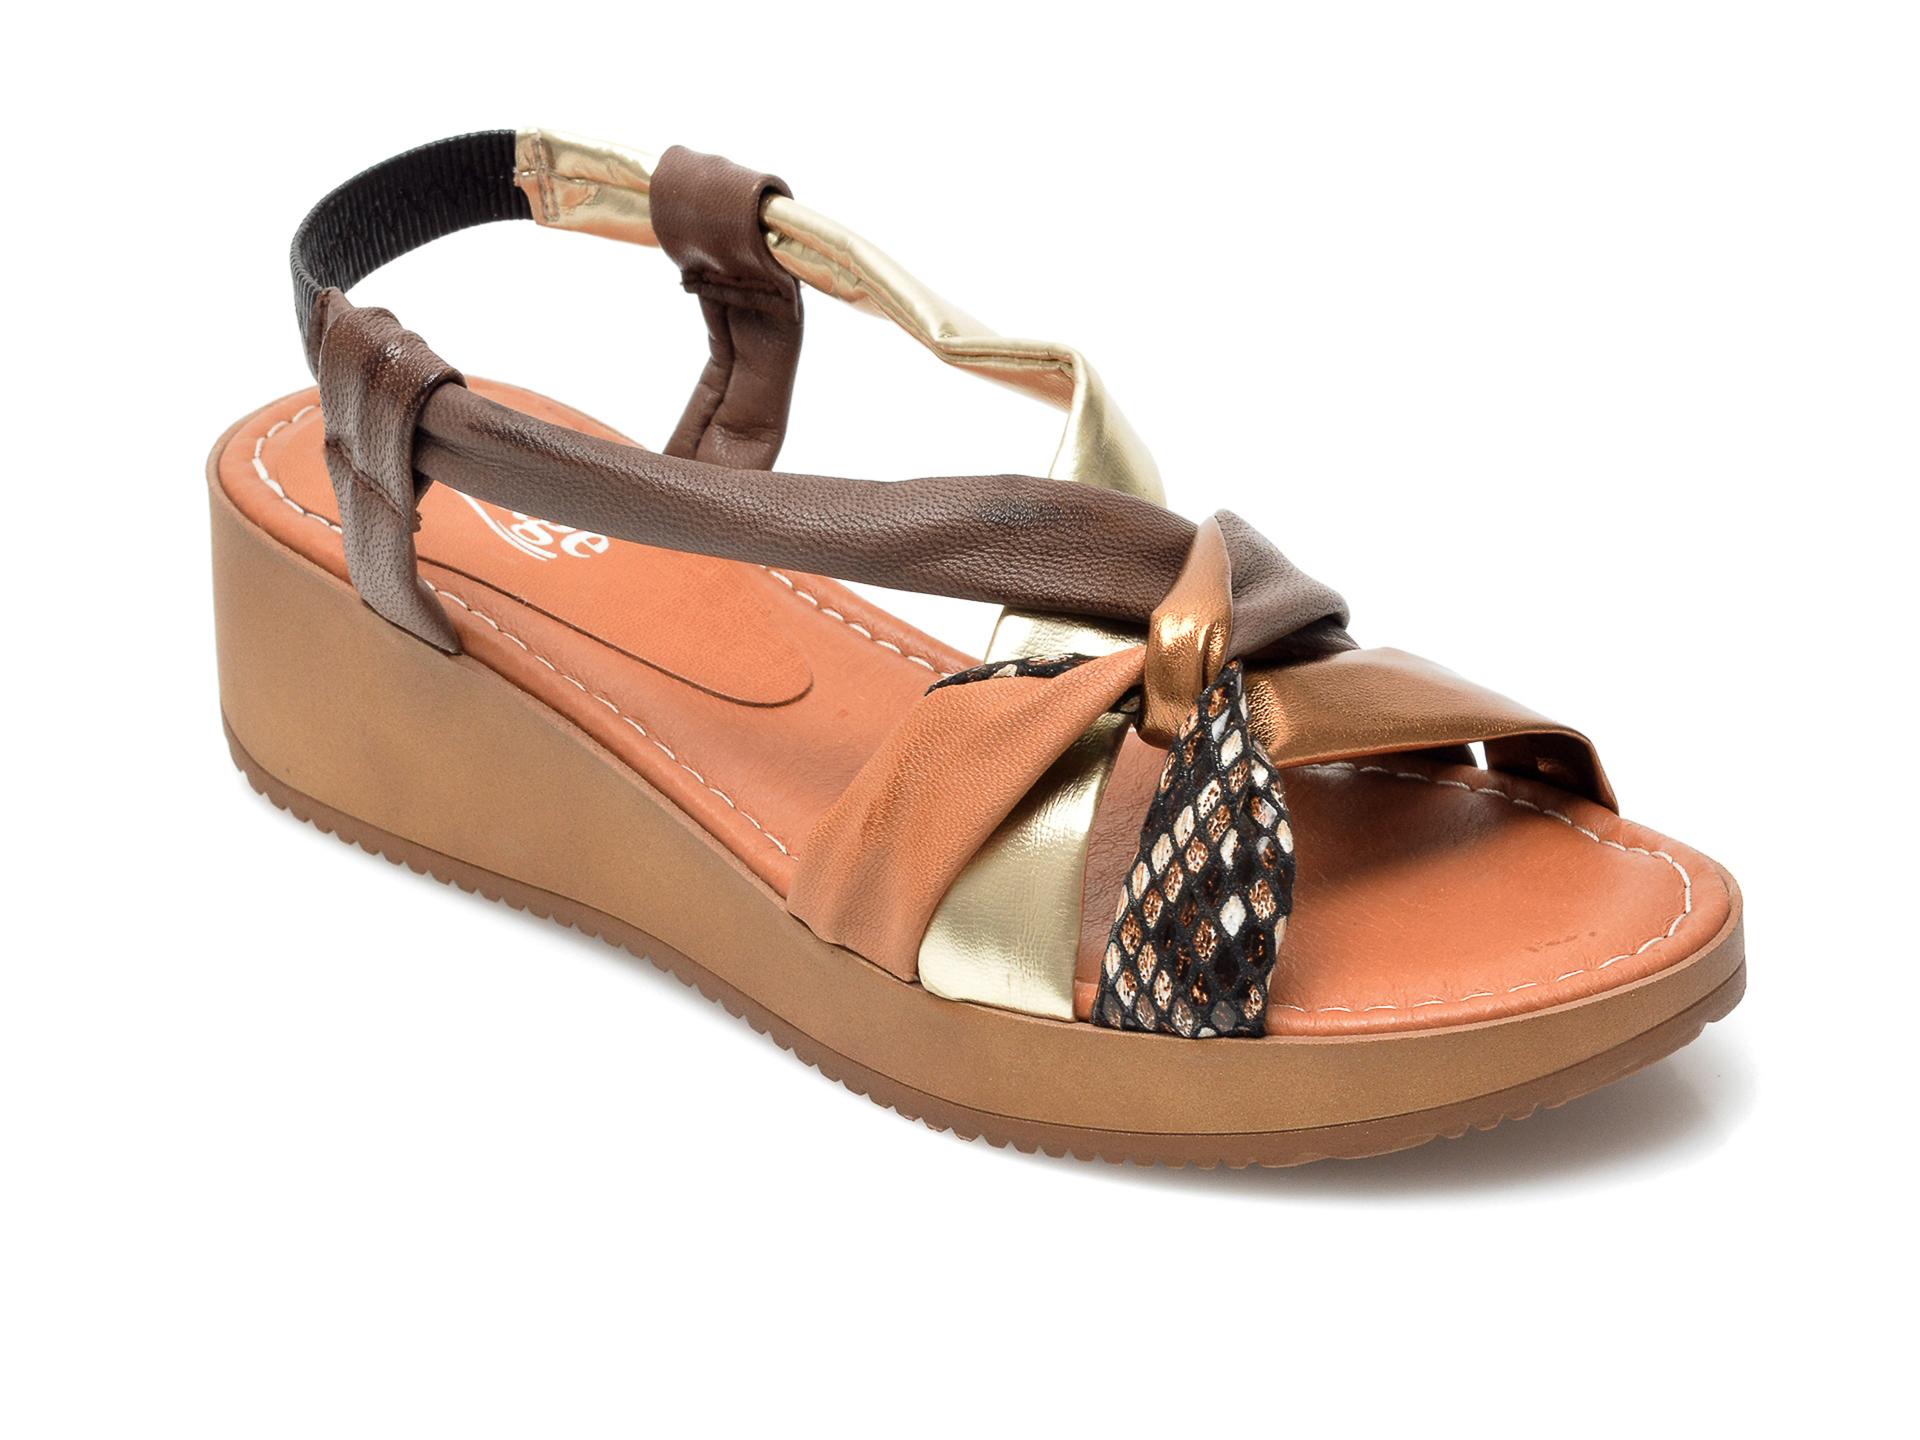 Sandale IMAGE maro, 1158LU, din piele naturala imagine otter.ro 2021